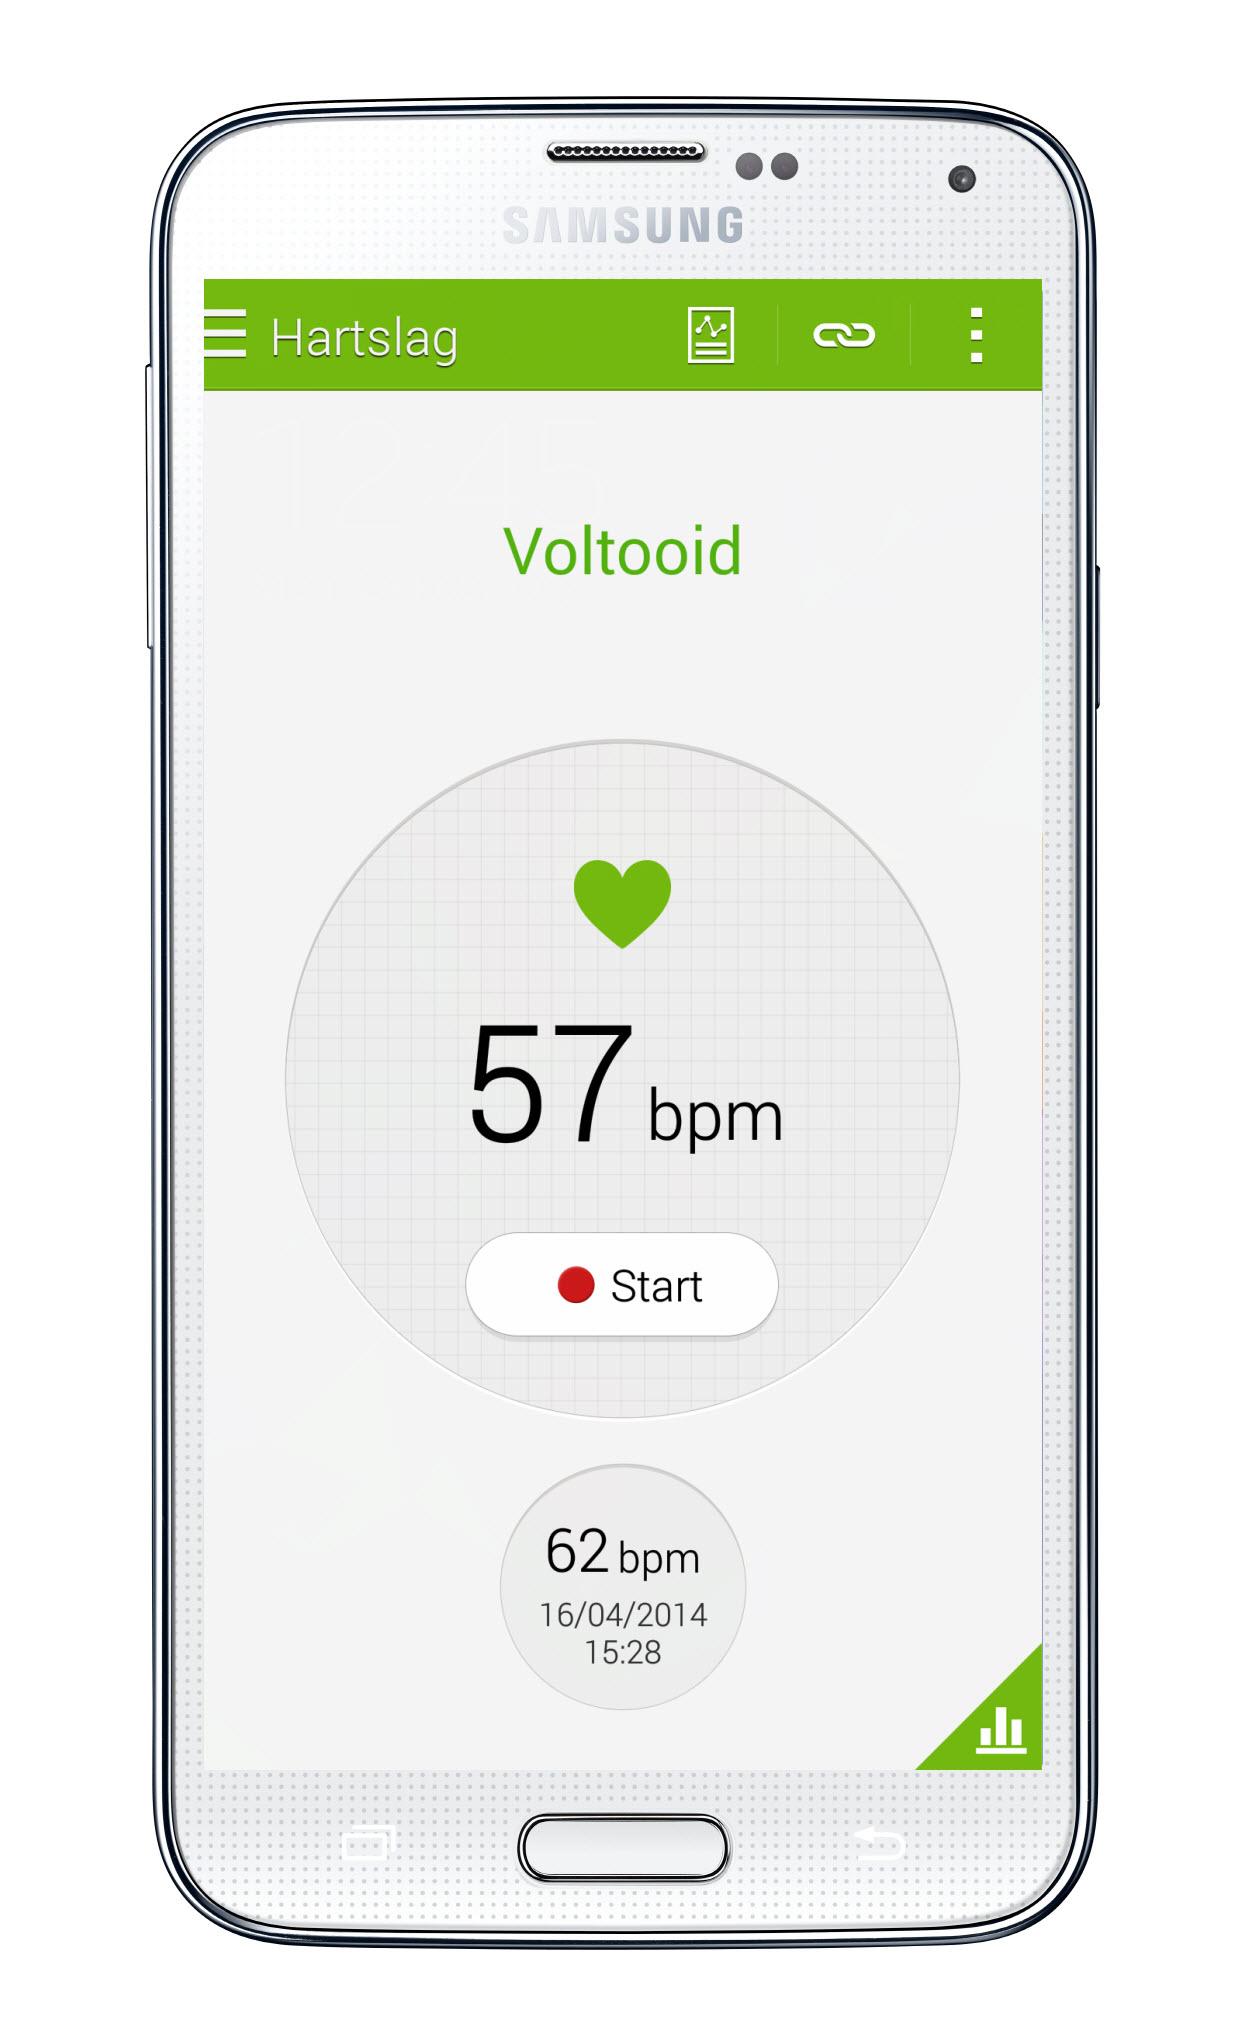 s-health-app